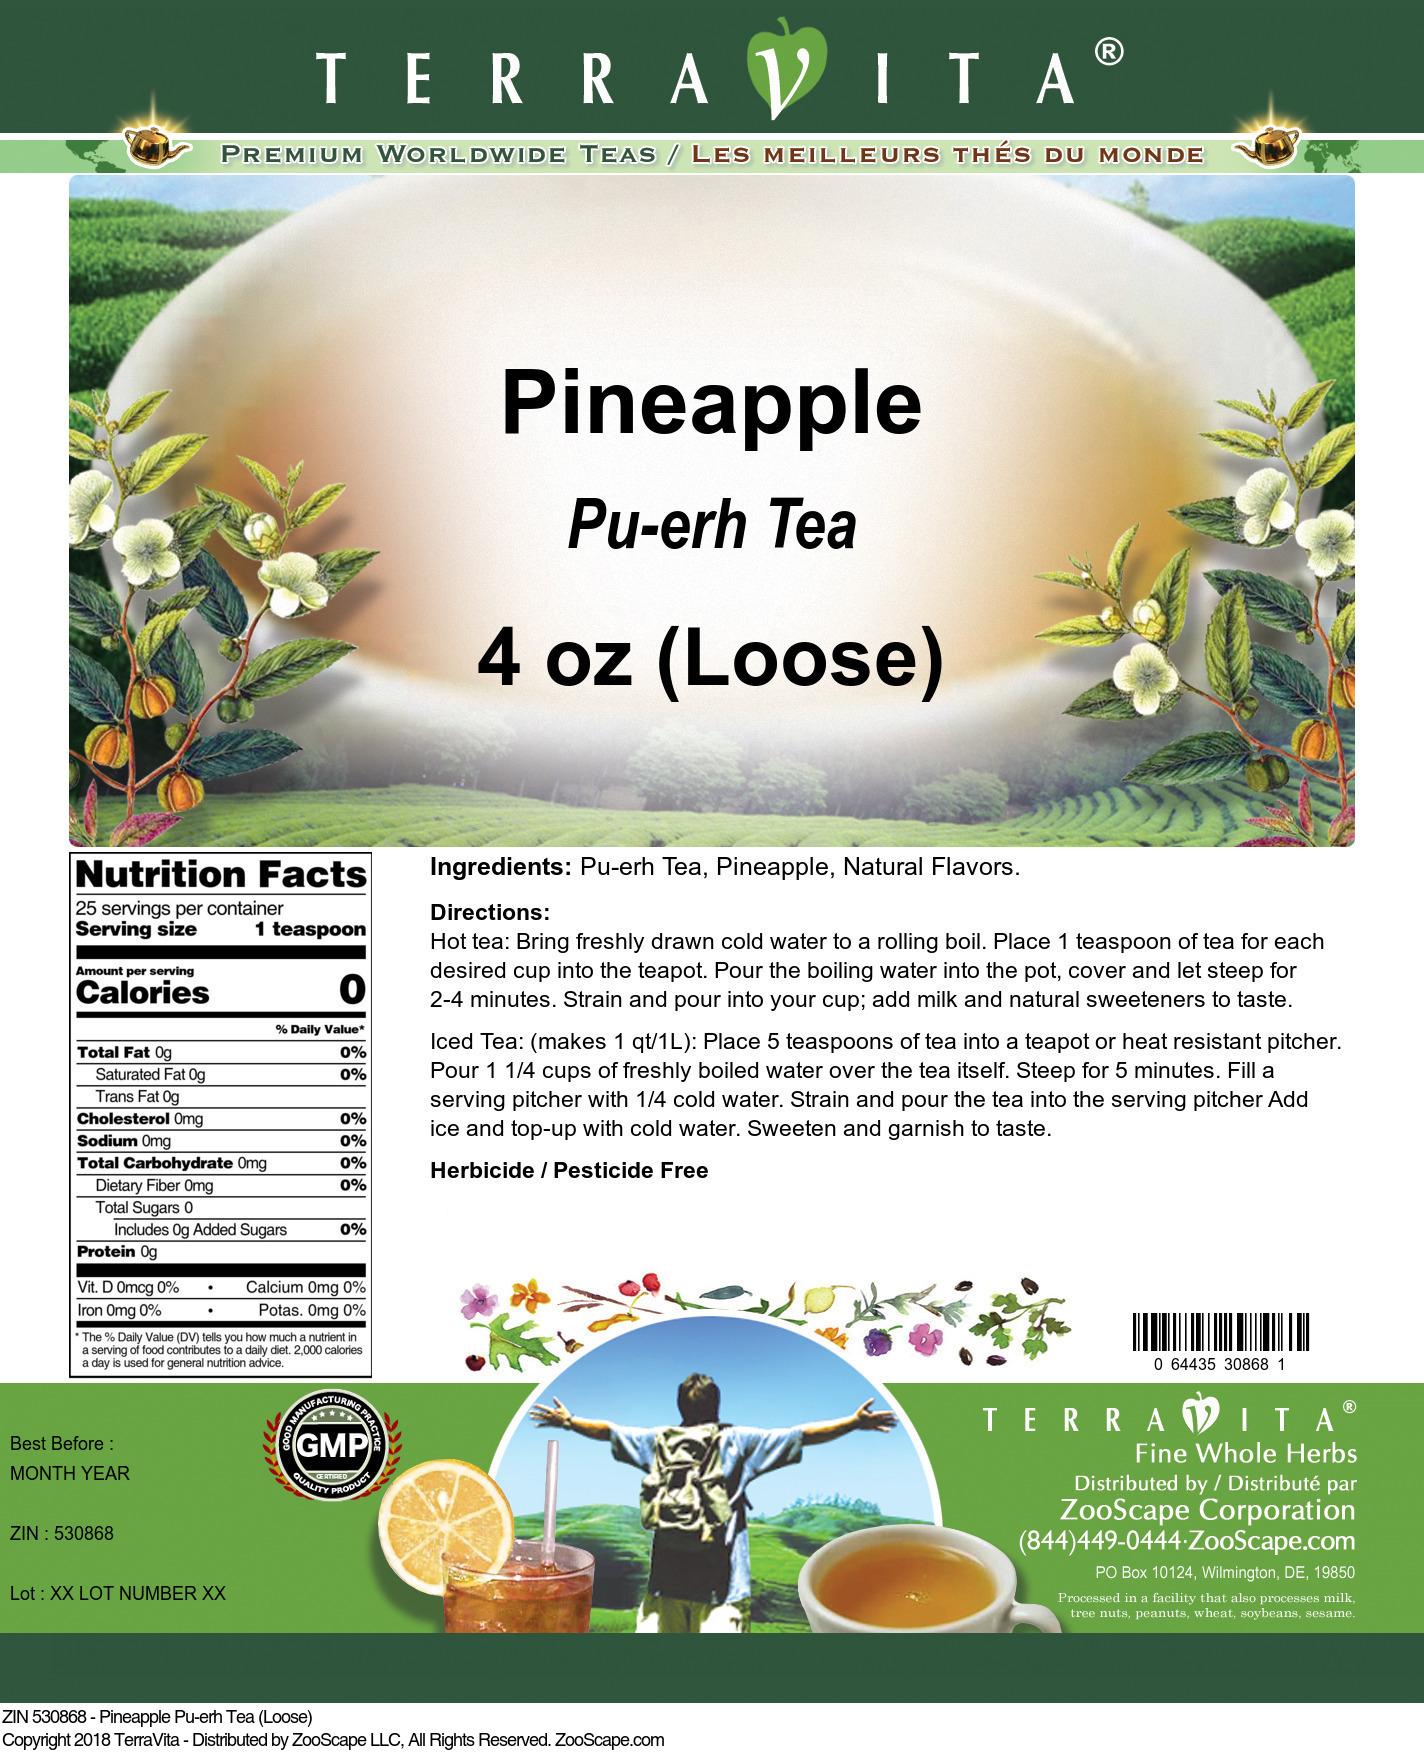 Pineapple Pu-erh Tea